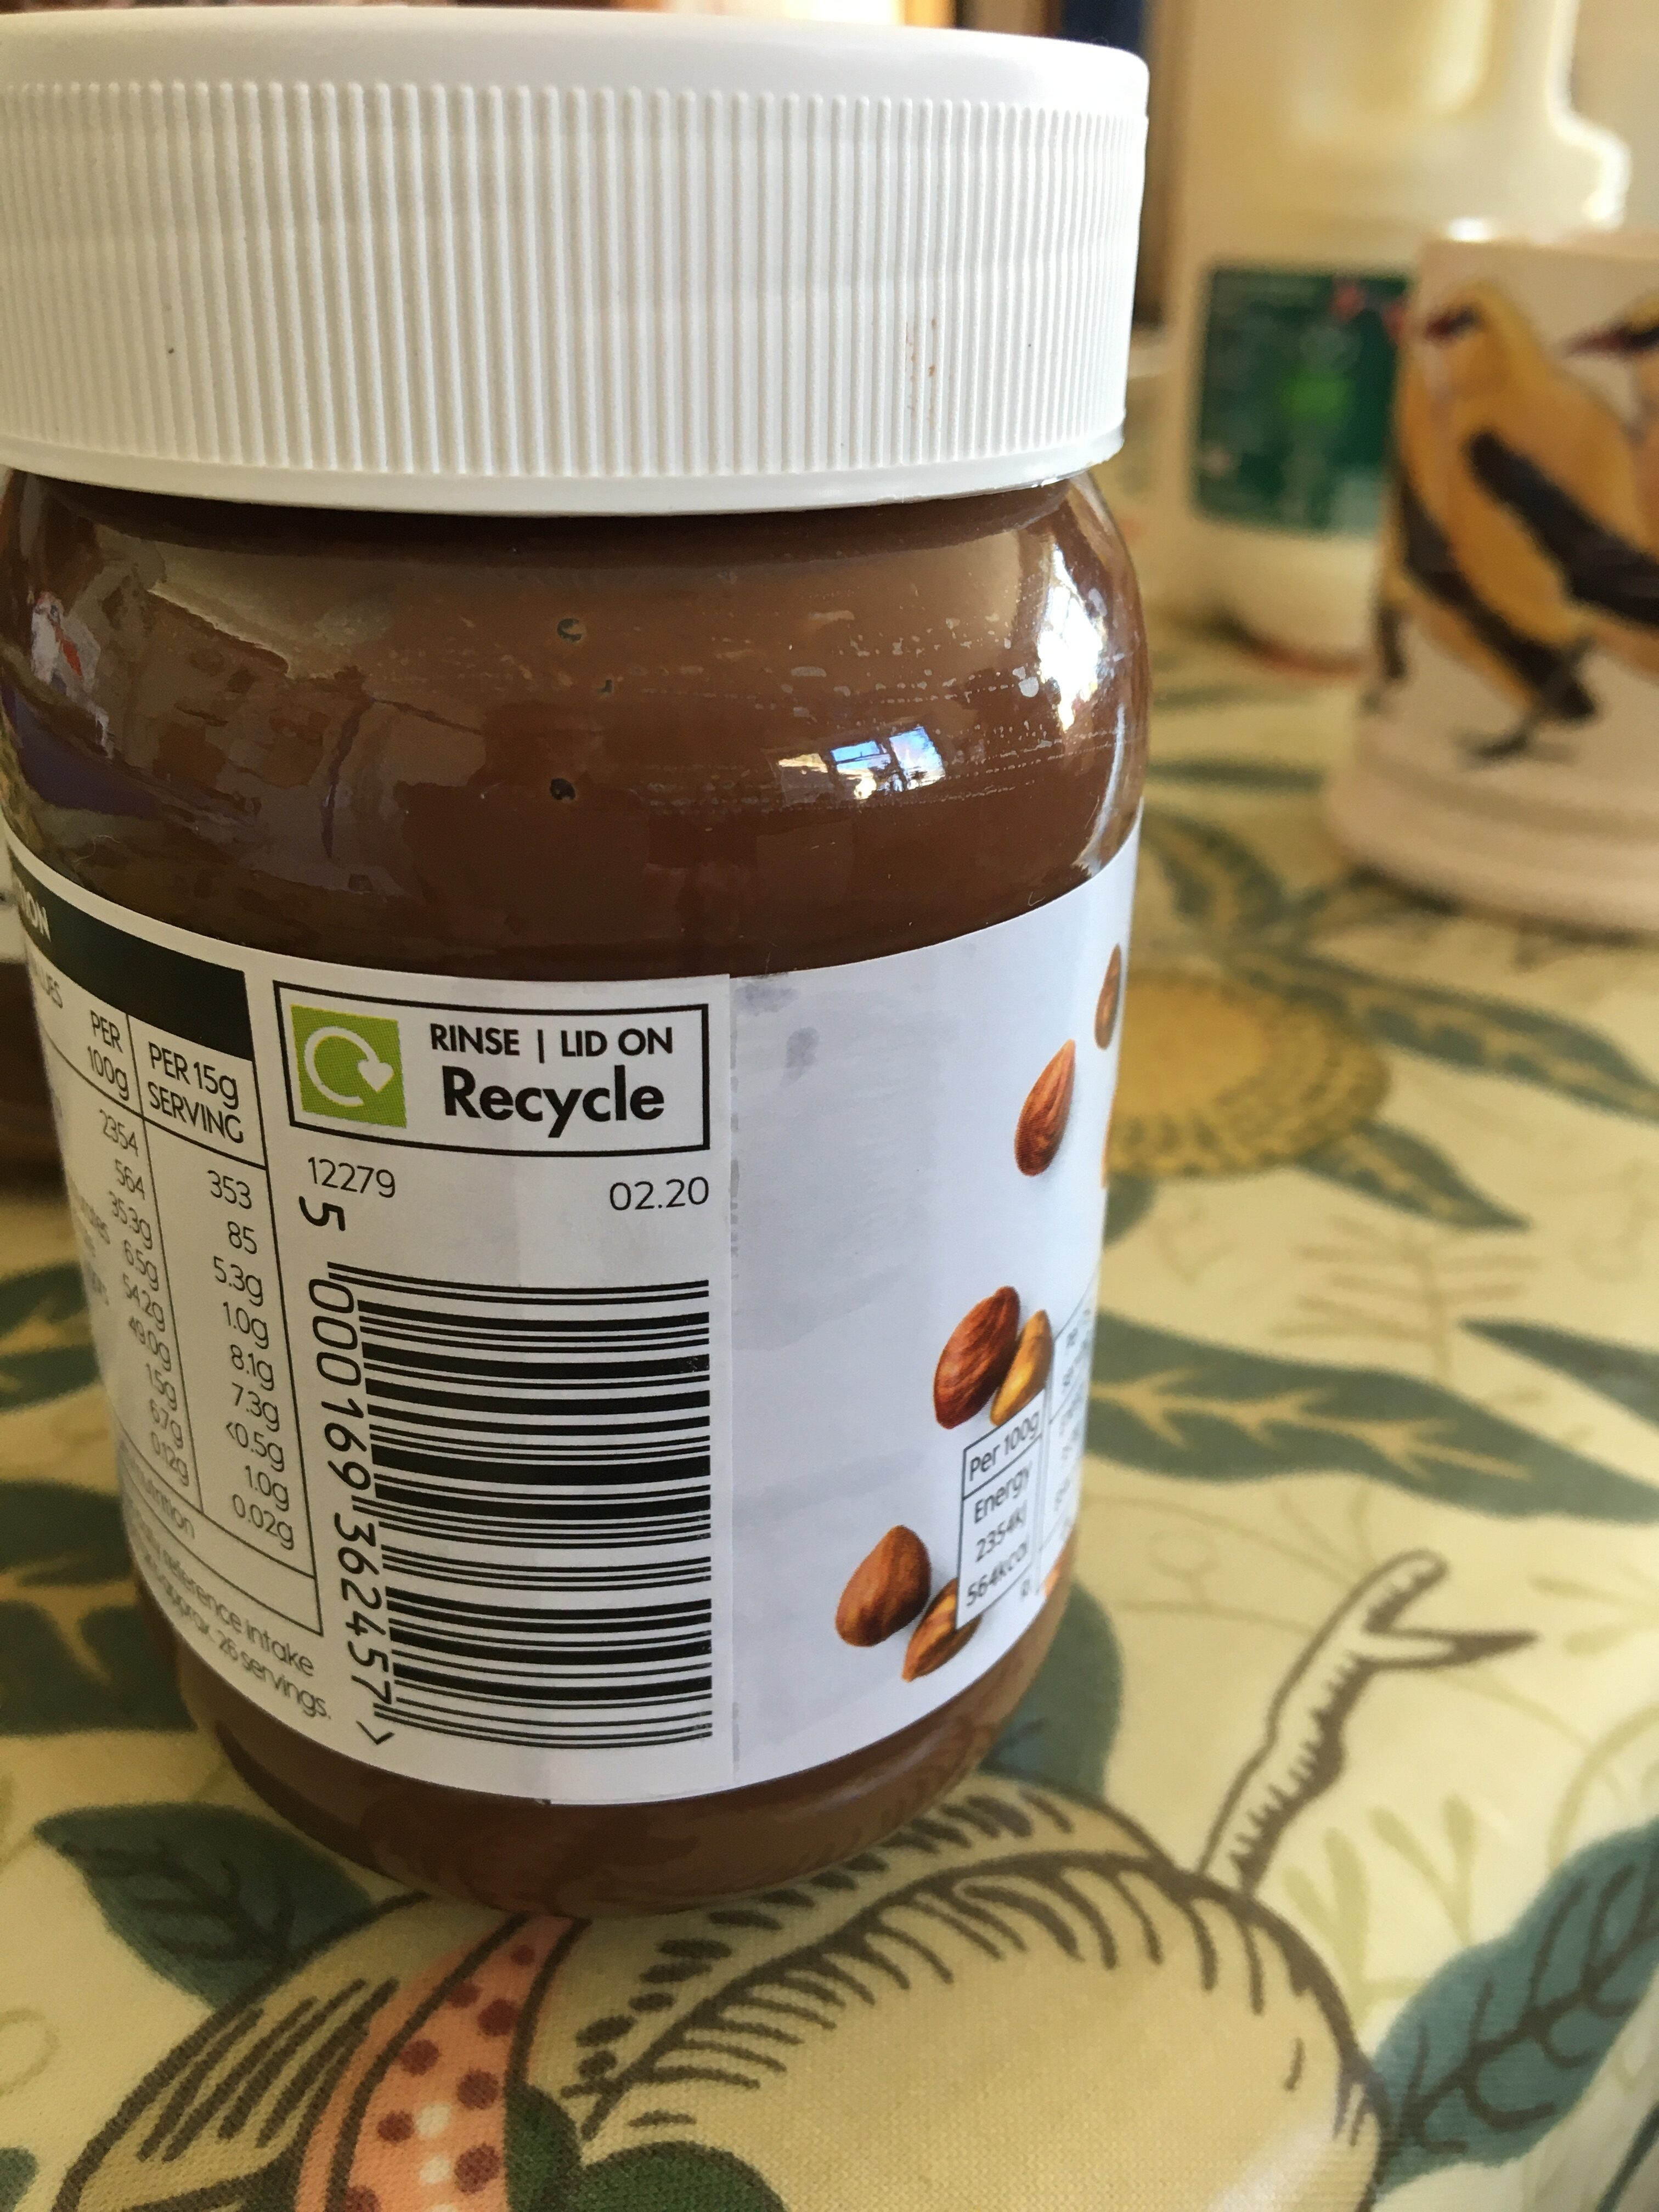 Hazelnut chocolate spread - Instruction de recyclage et/ou informations d'emballage - en